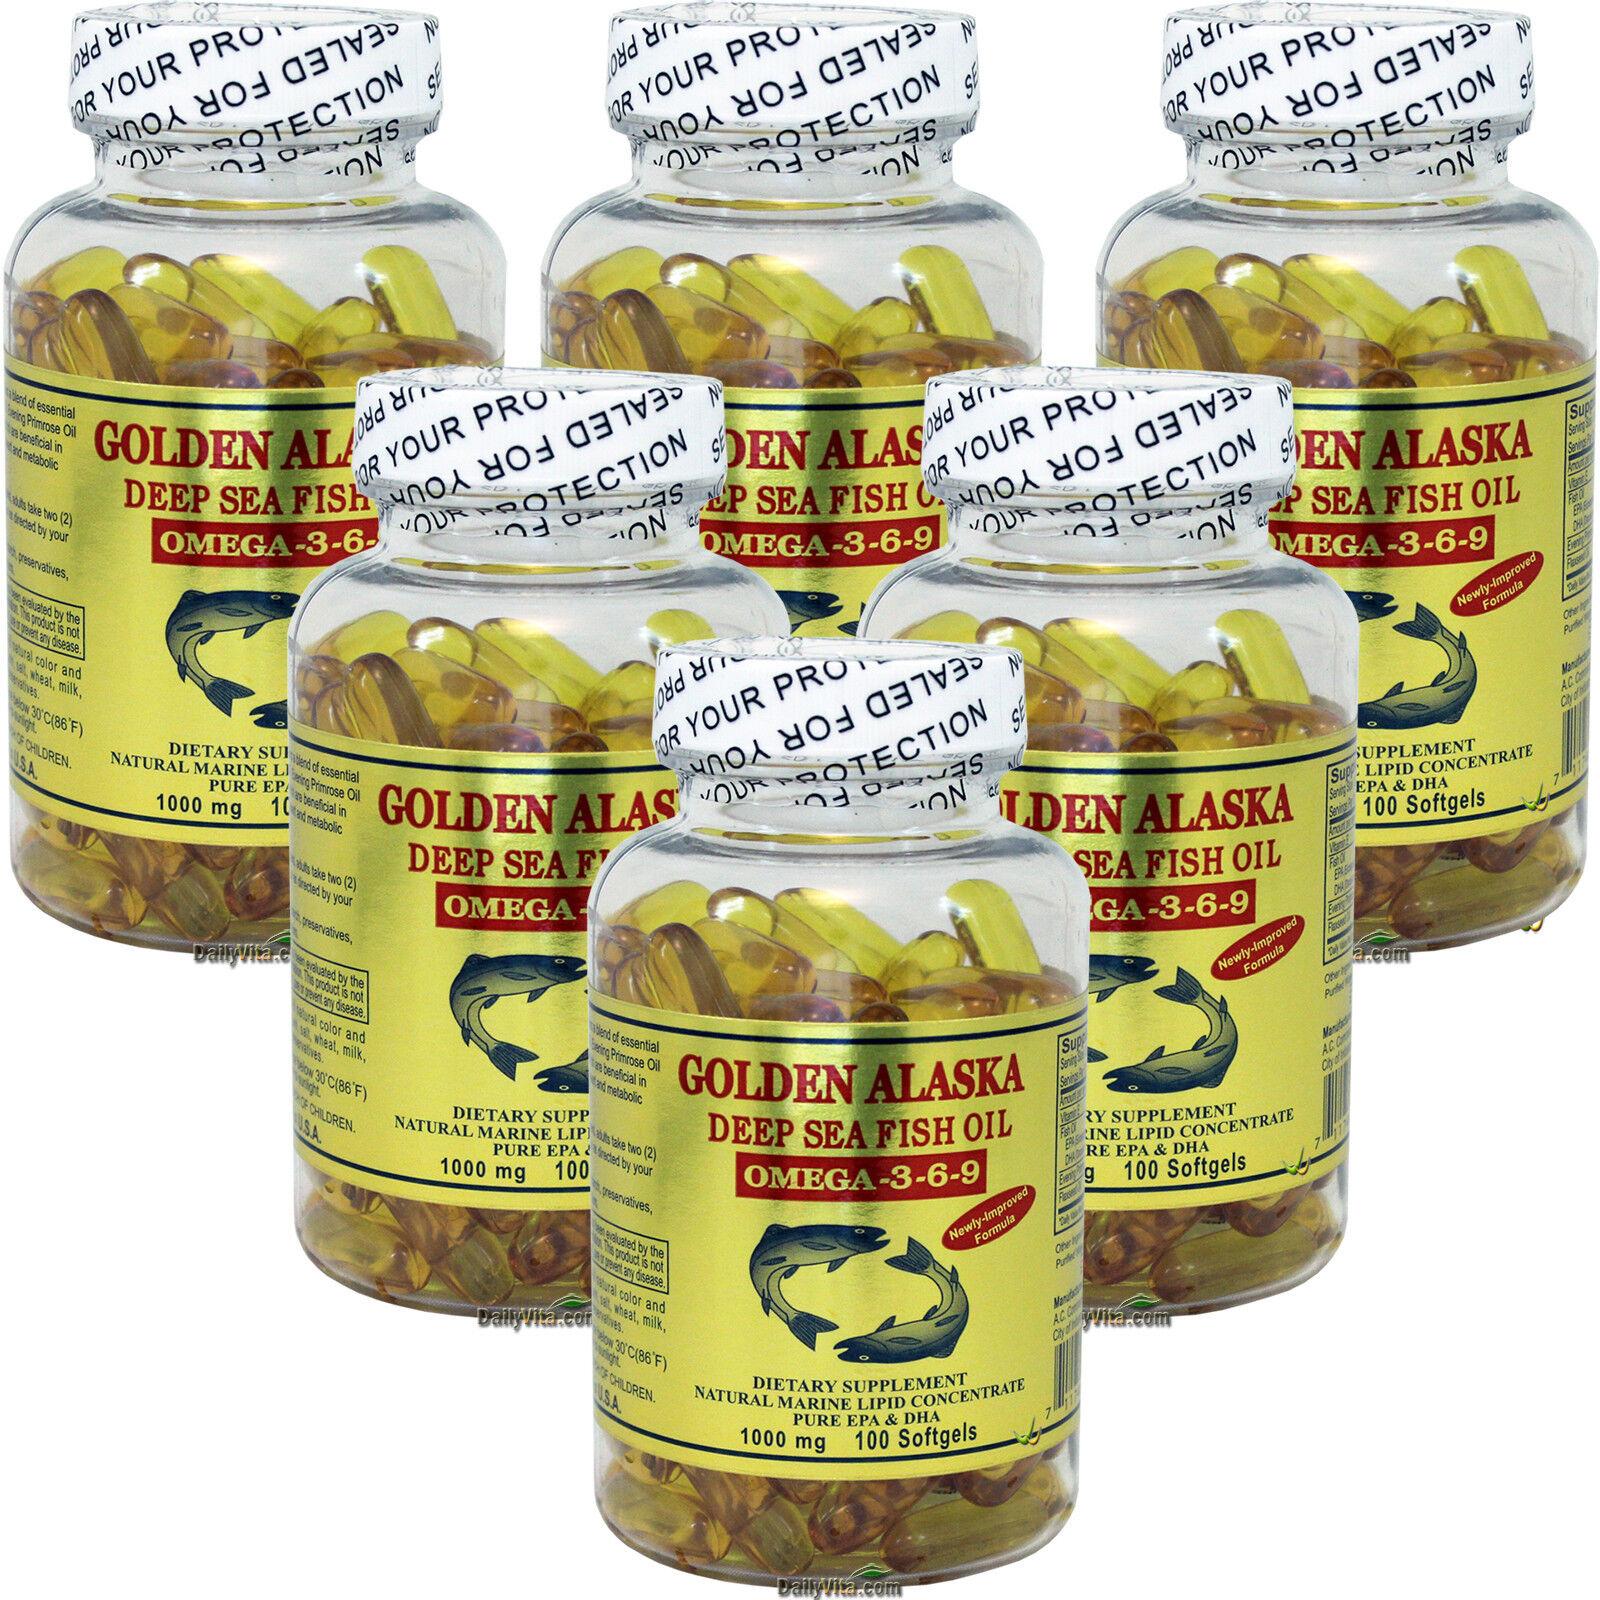 6x Golden Alaska Deep Sea Fish Oil Omega-3-6-9 1000mg 100 SG DHA EPA Made In USA